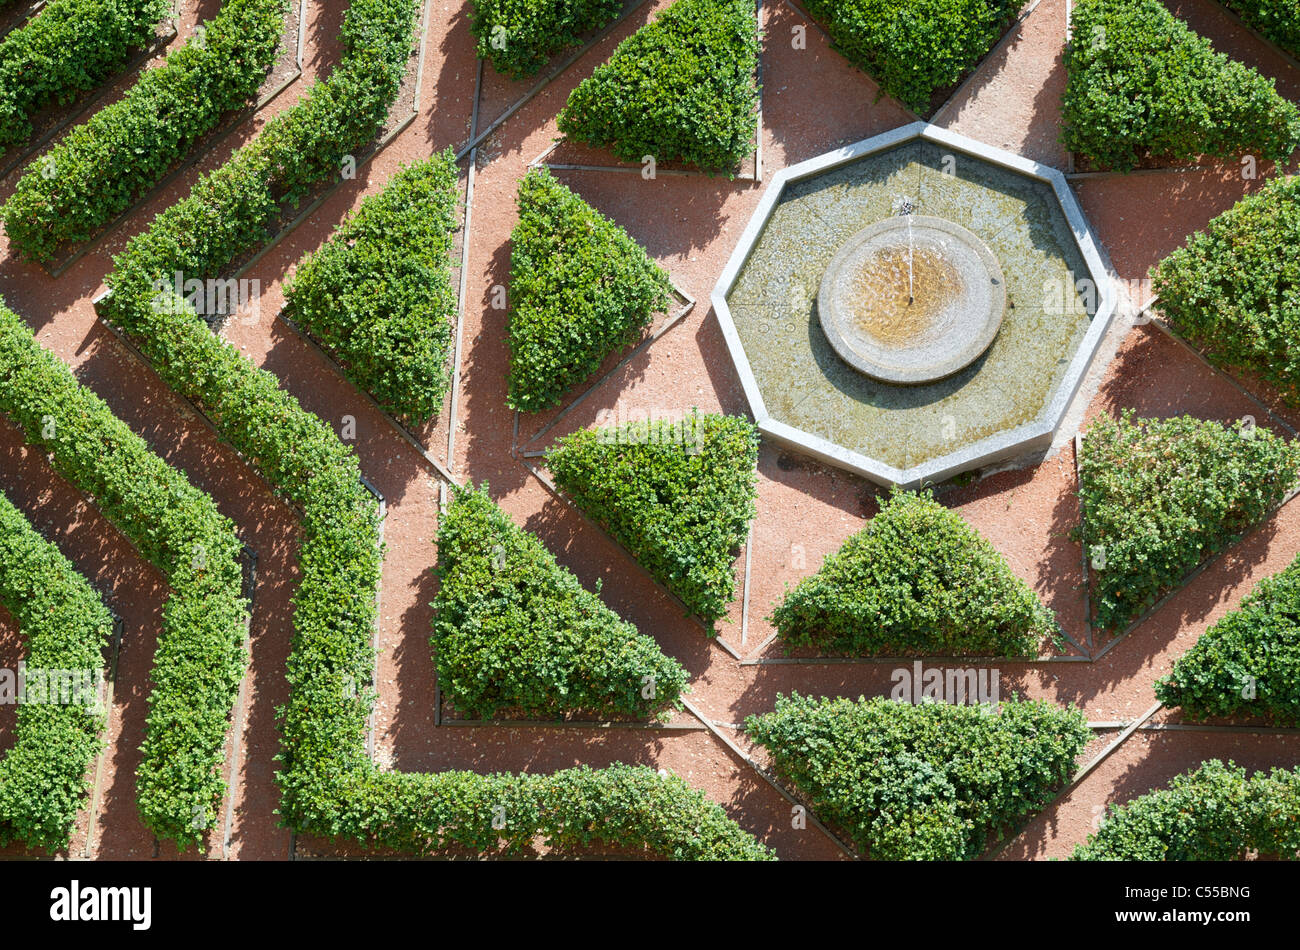 Vue de dessus d'un jardin à l'Alcazar de Segovia, Castilla Leon, Espagne Photo Stock